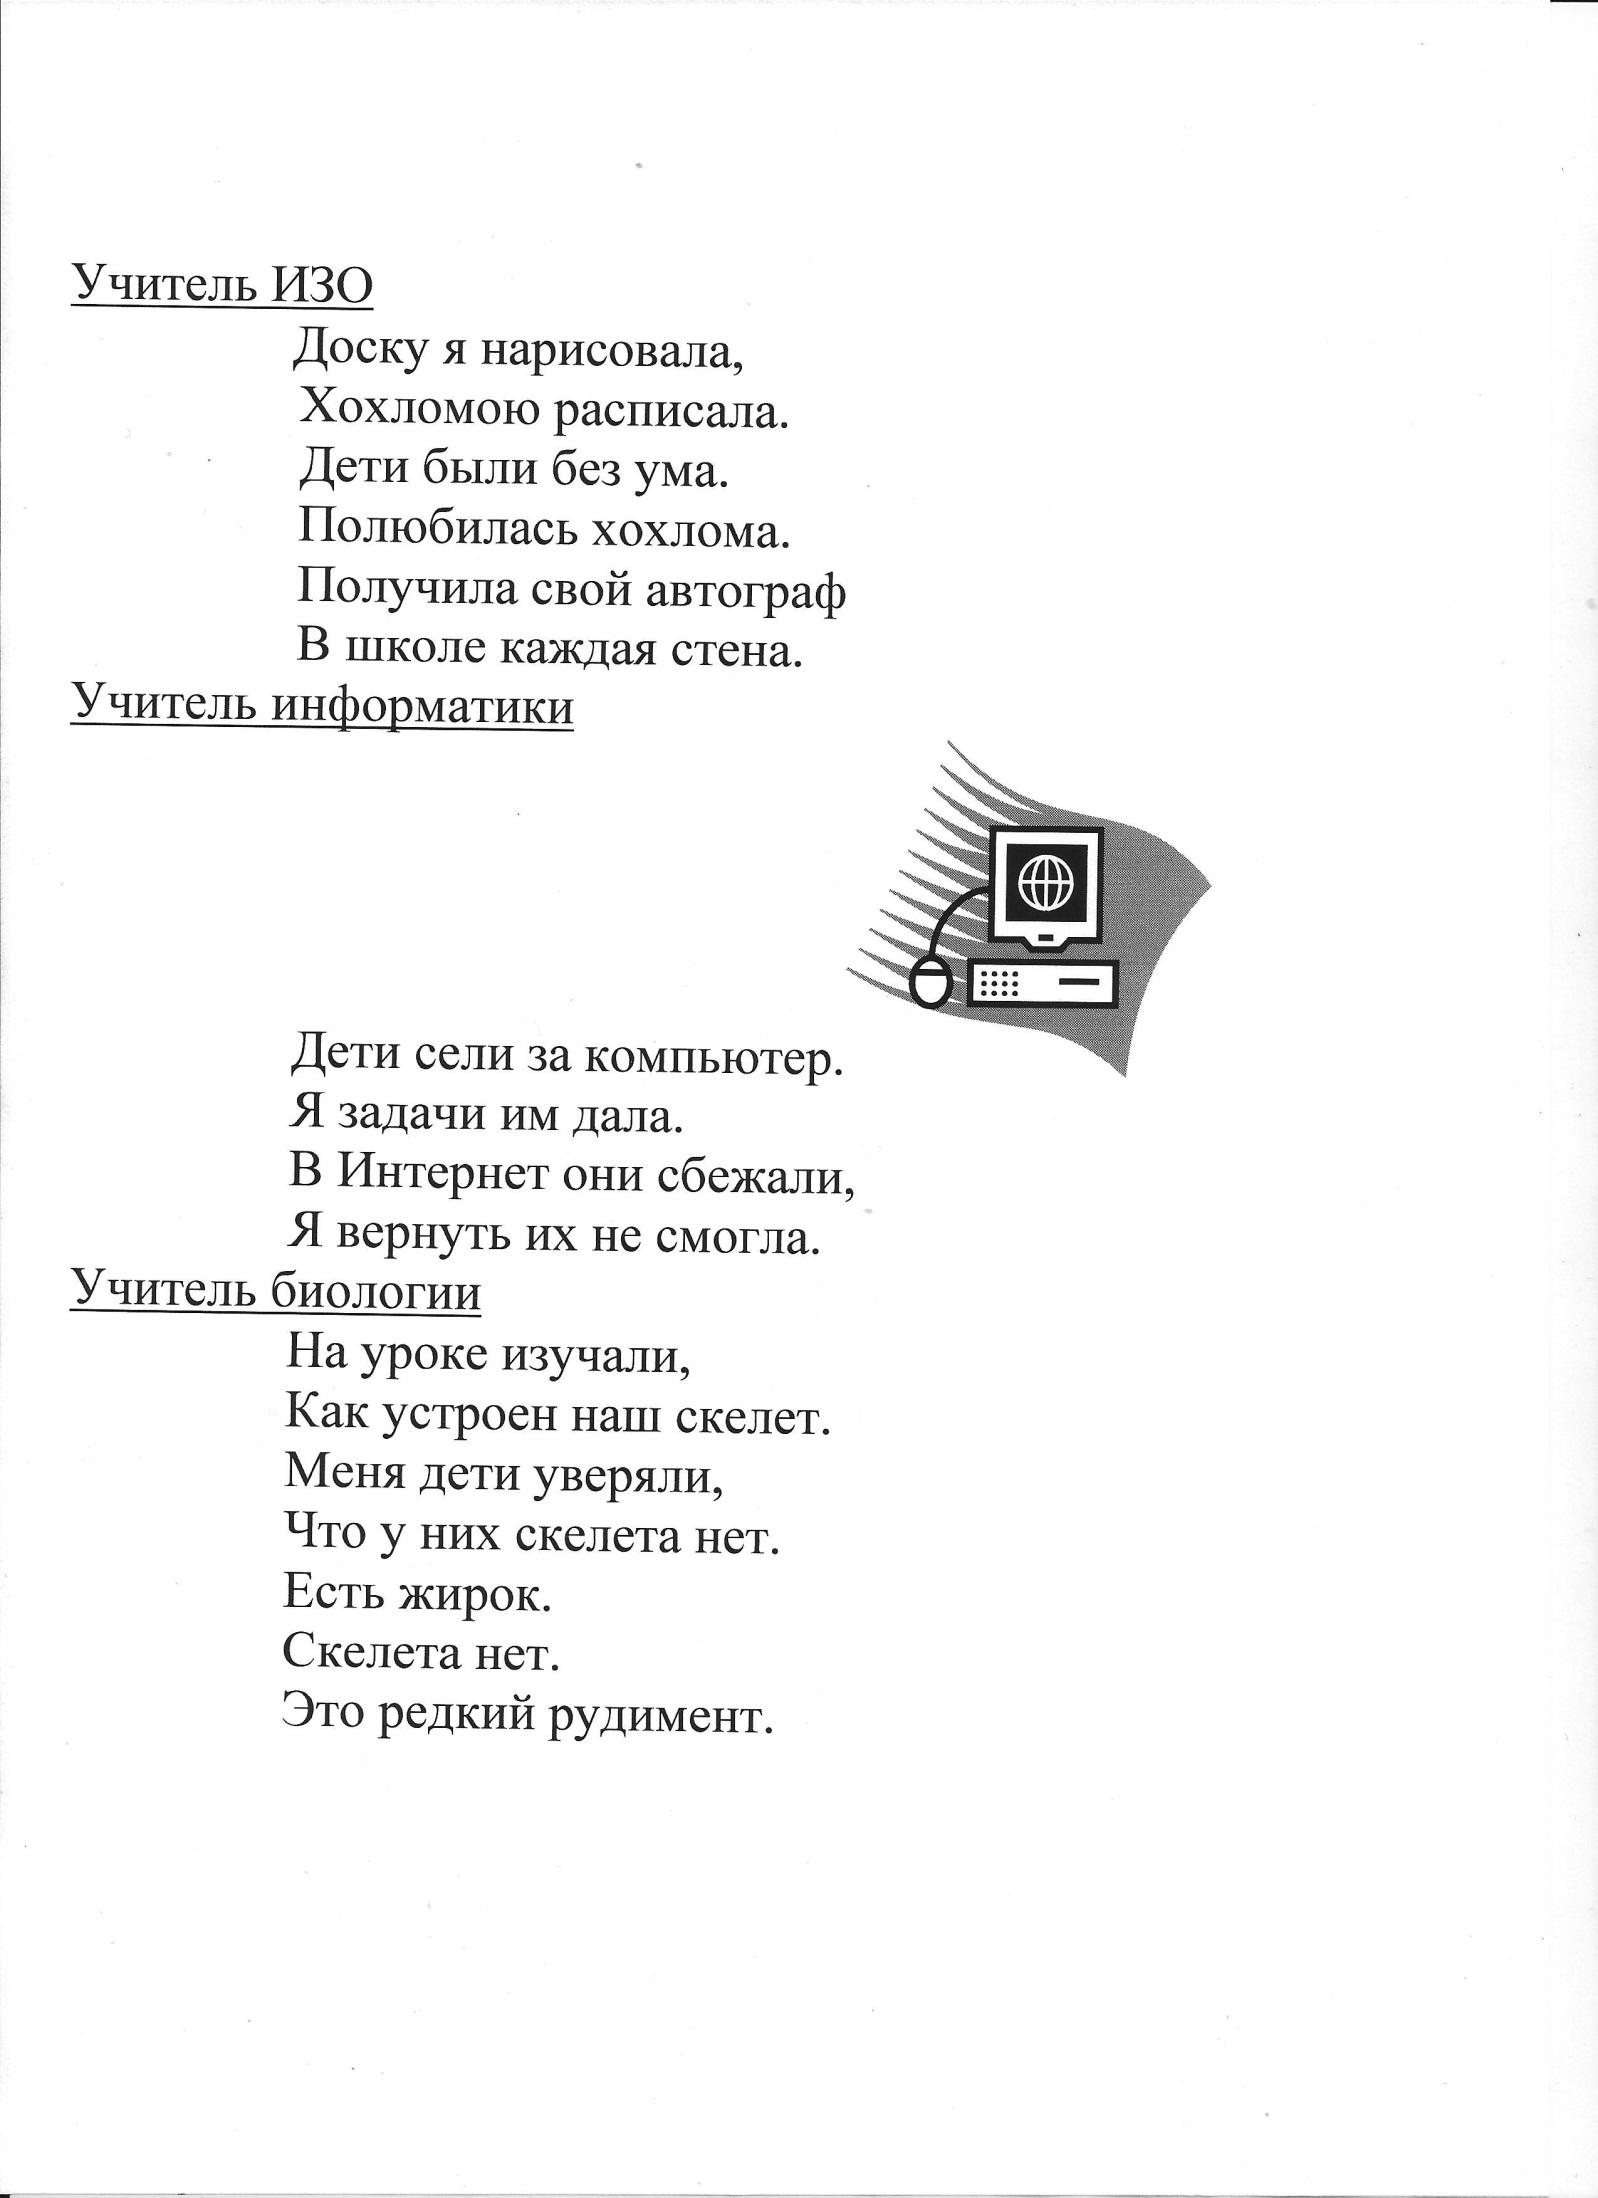 C:\Users\днс\Desktop\сканы сценариев Розовой\Ко дню учителя\scan0008.jpg